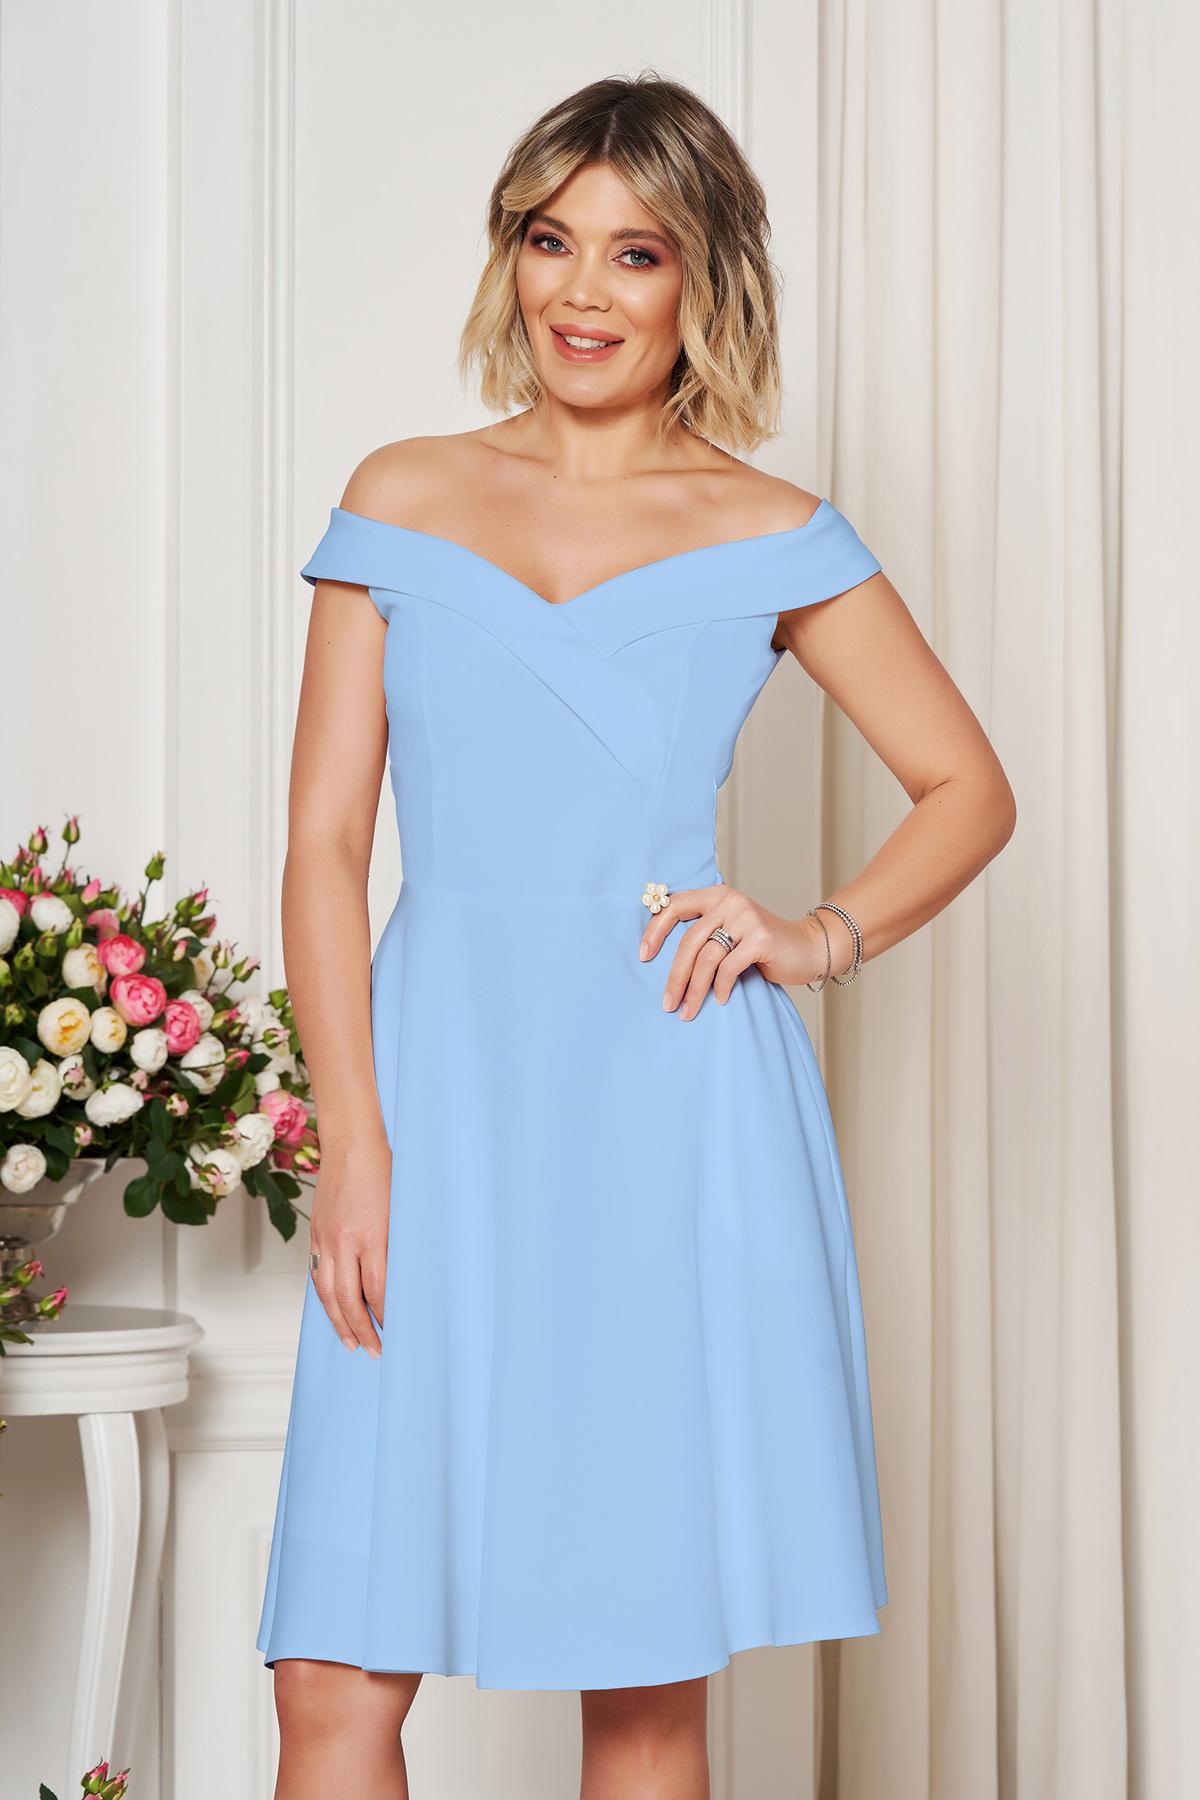 Rochie StarShinerS albastru-deschis de ocazie eleganta in clos cu decolteu cu umeri goi din stofa elastica subtire